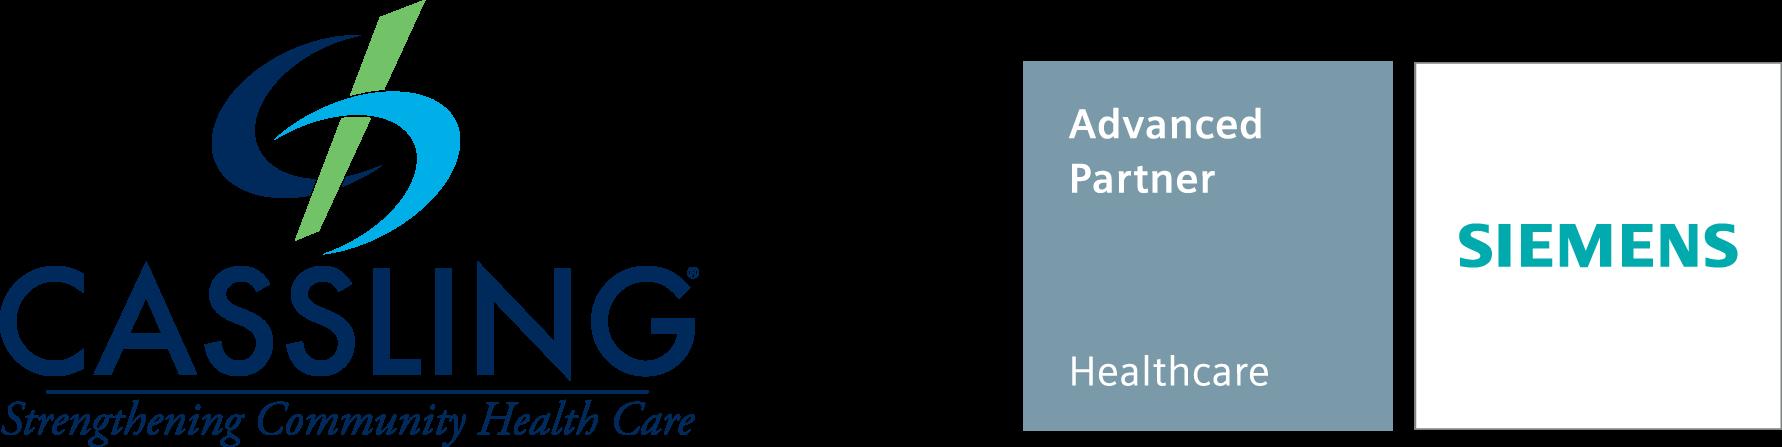 Cassling_Logo_Advanced_Partner_logo2.png